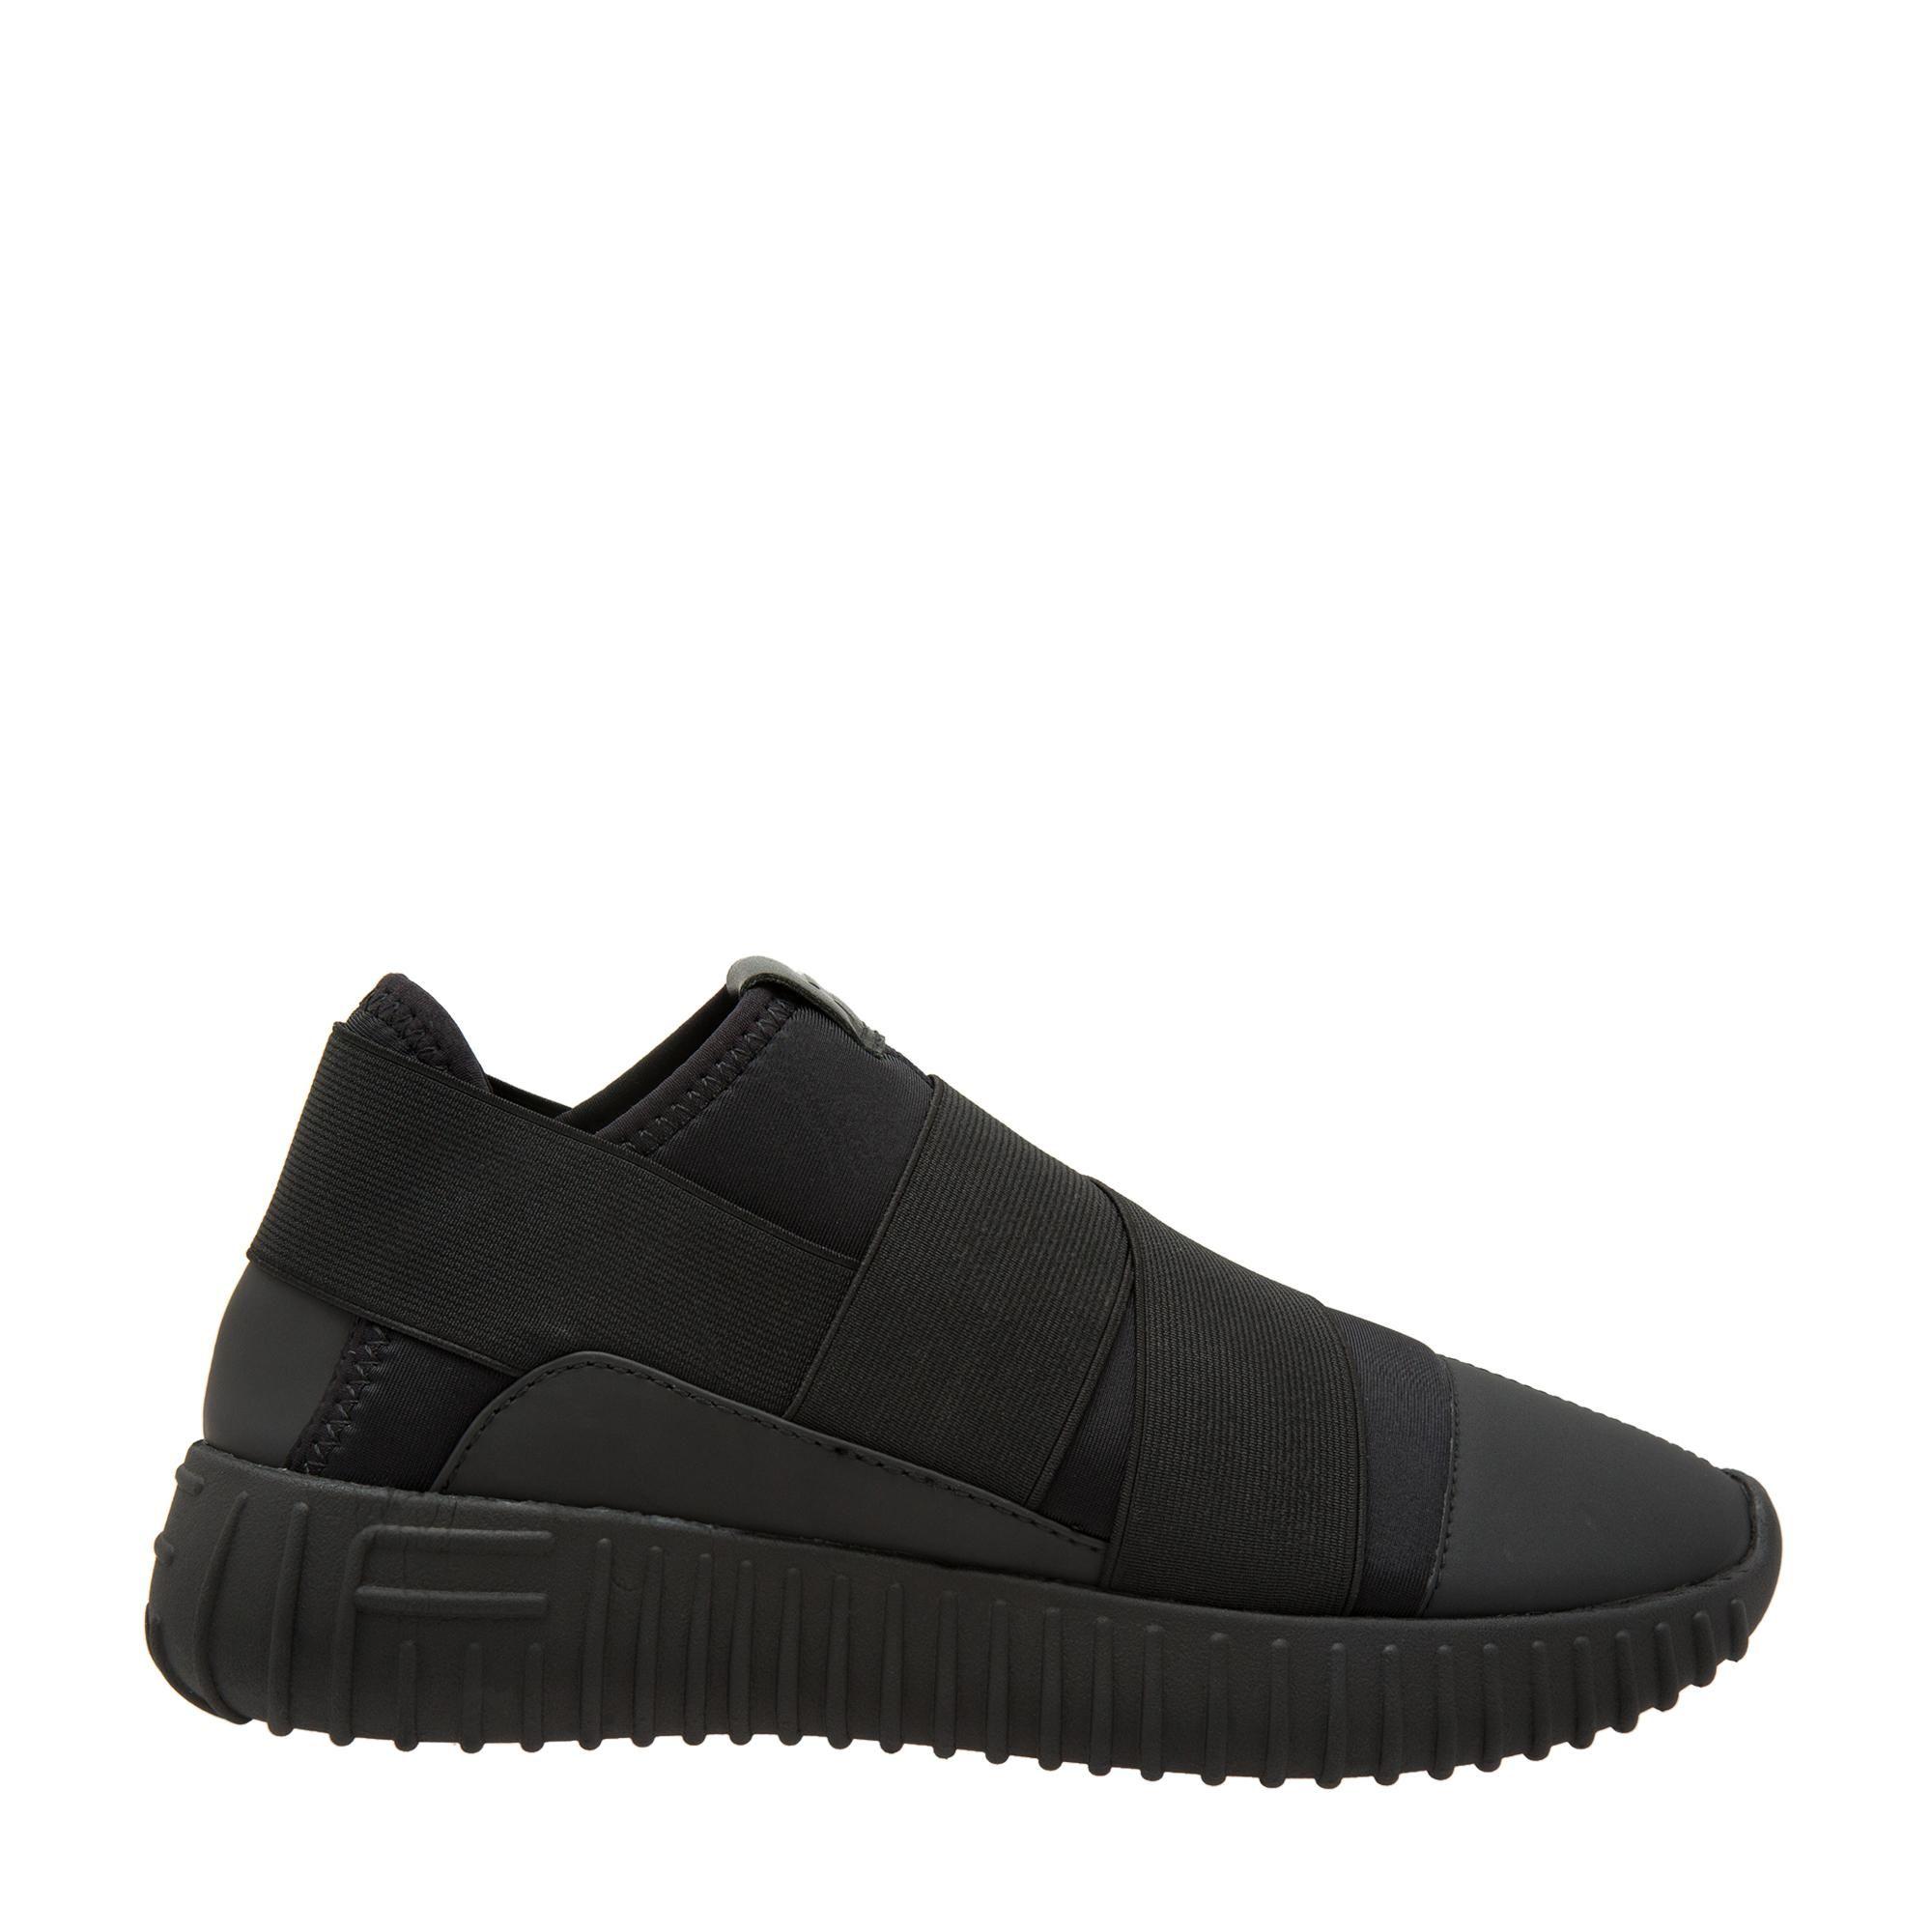 Sockband sneakers